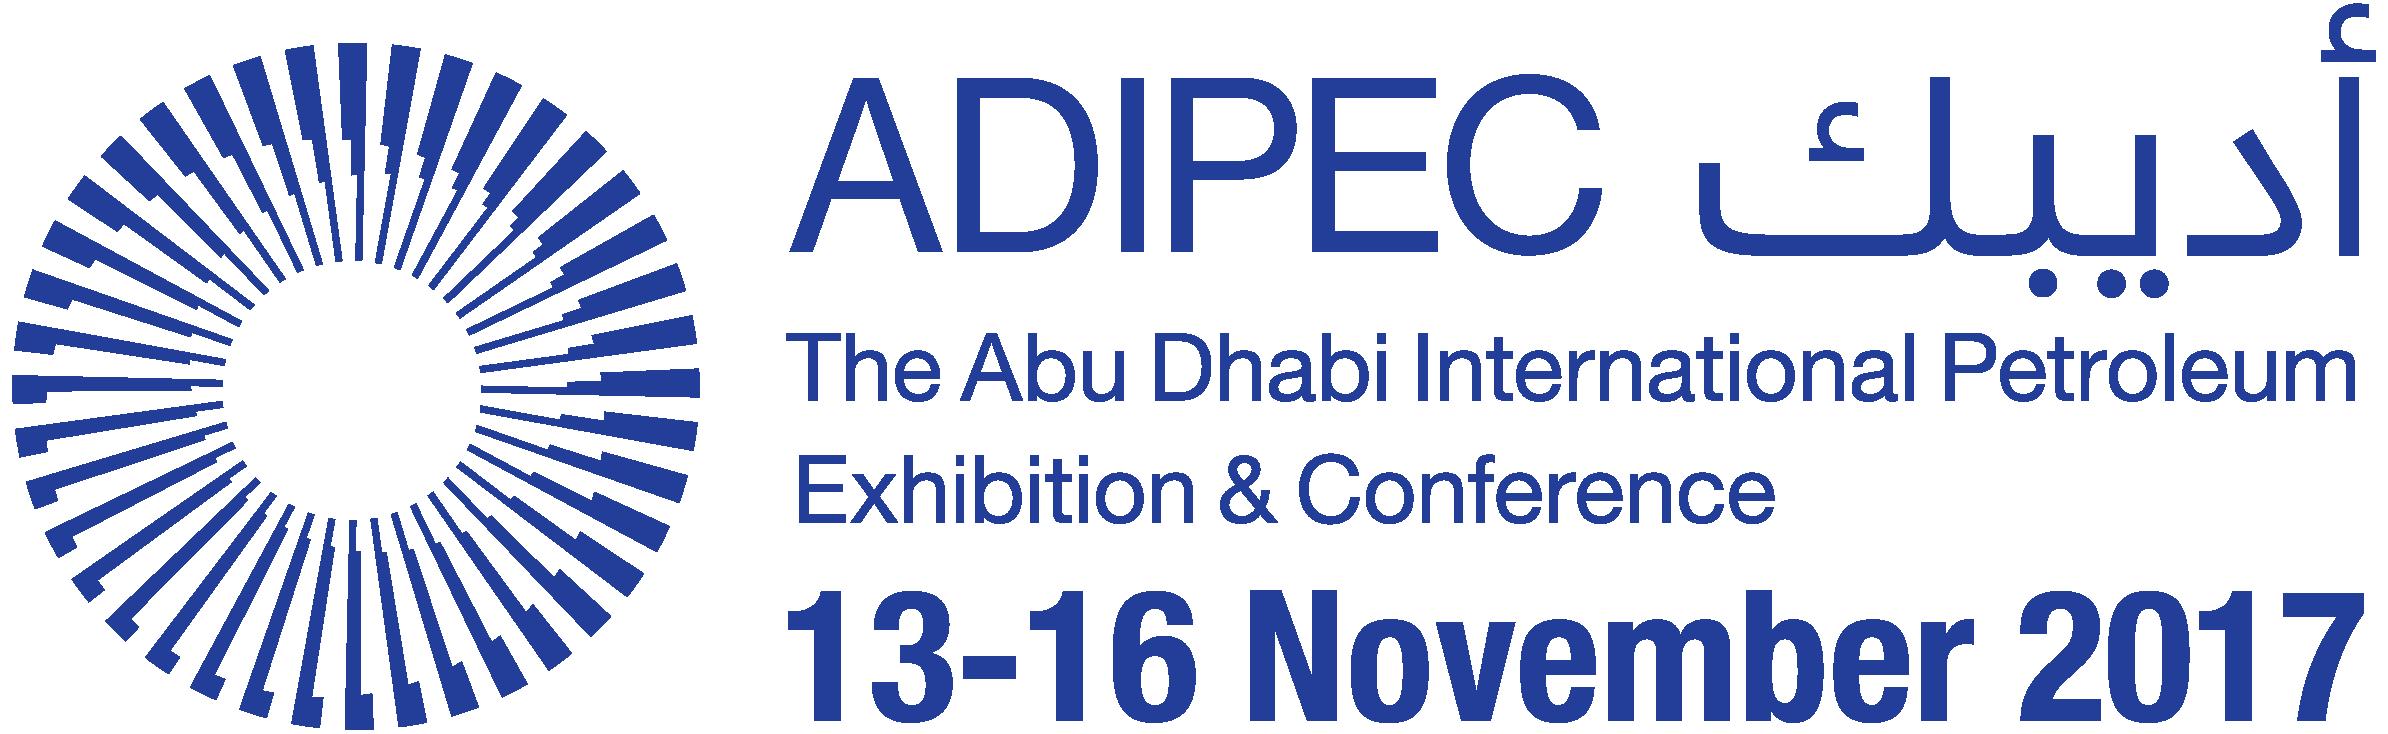 ADIPEC 2017 logo-07